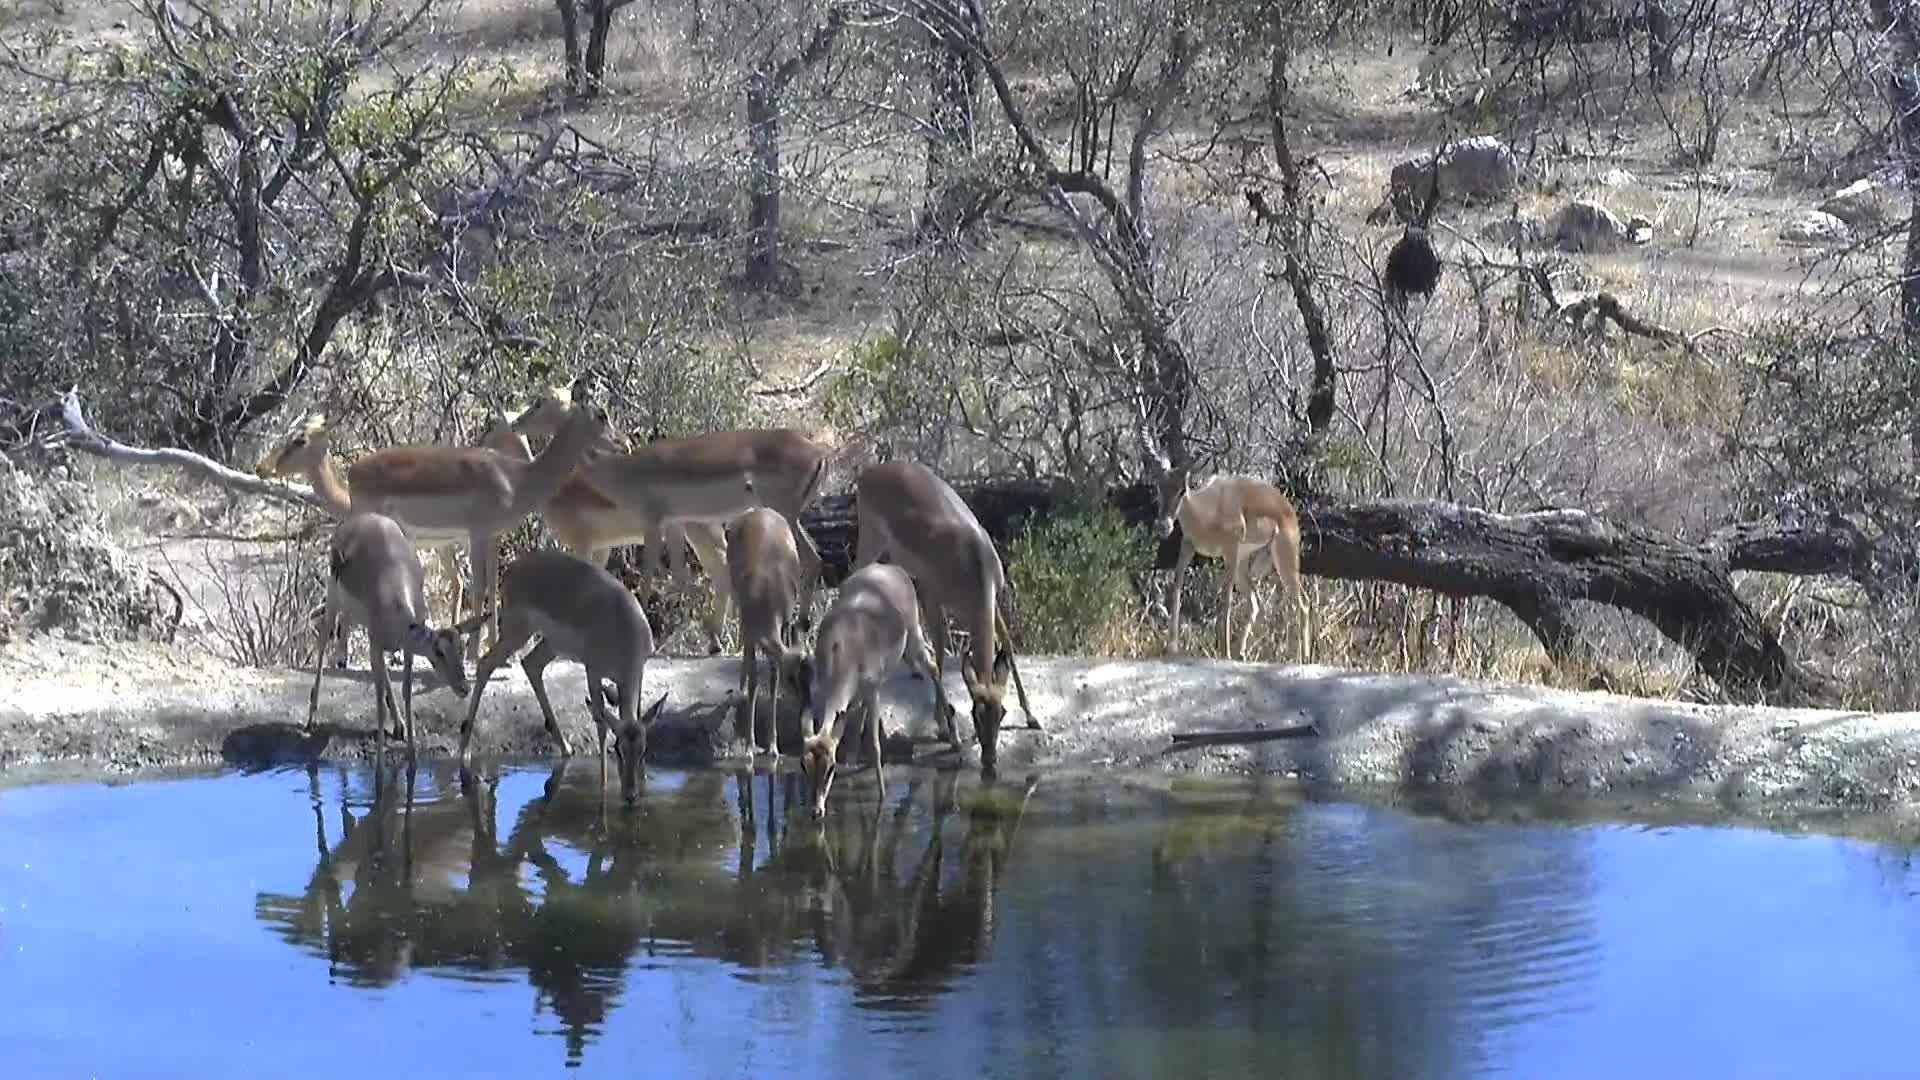 VIDEO: Giraffe  and Impalas  at the  waterhole